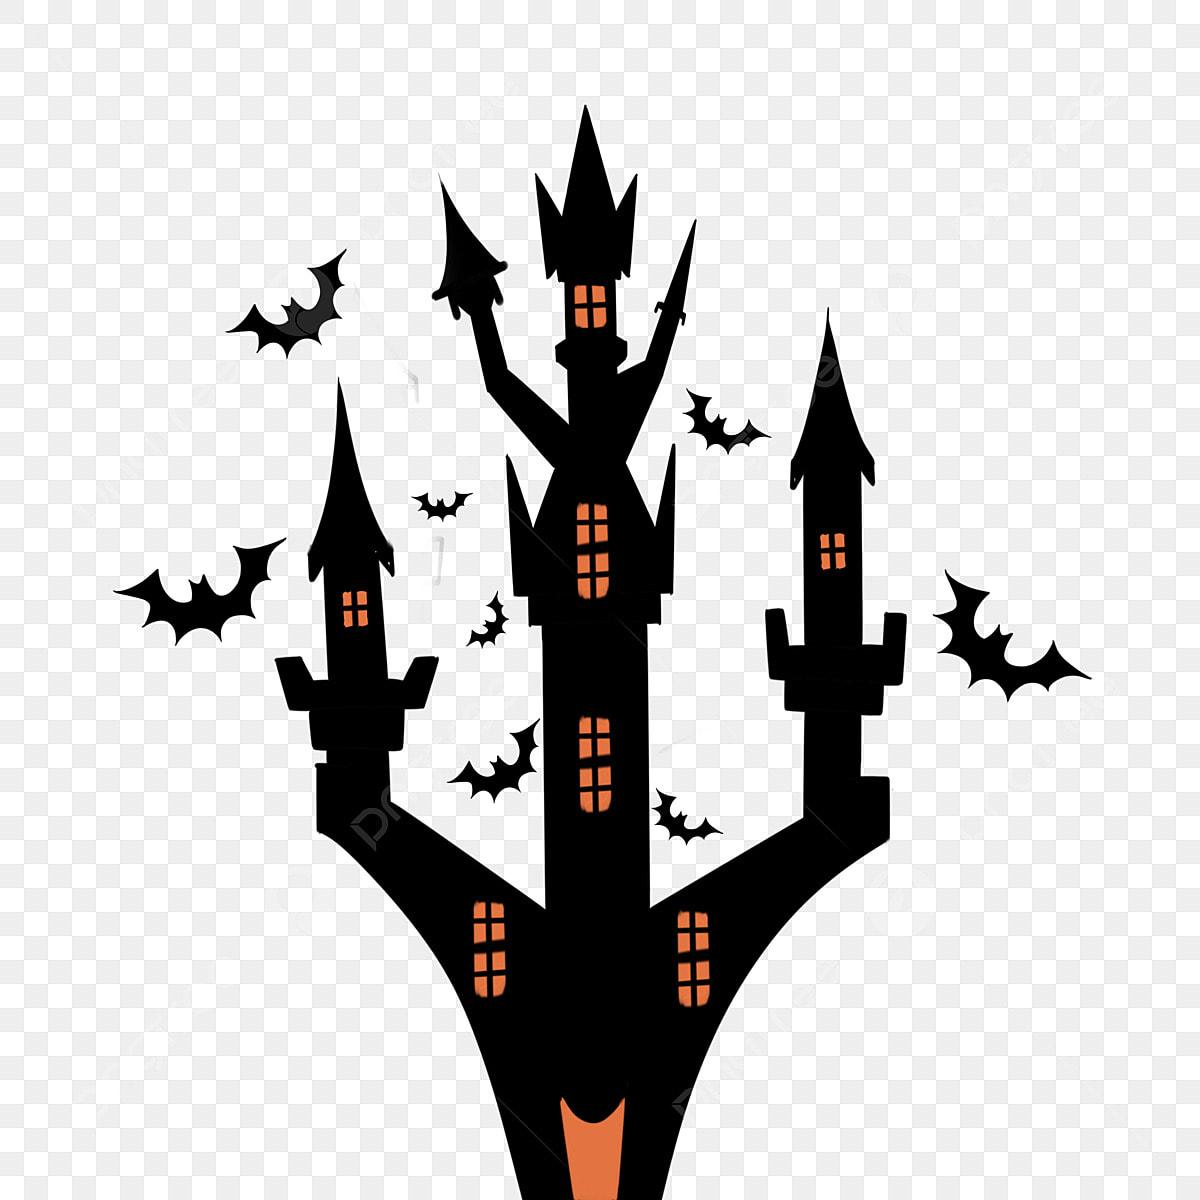 Halloween Thème Maison Hantée Noire Illustration Halloween